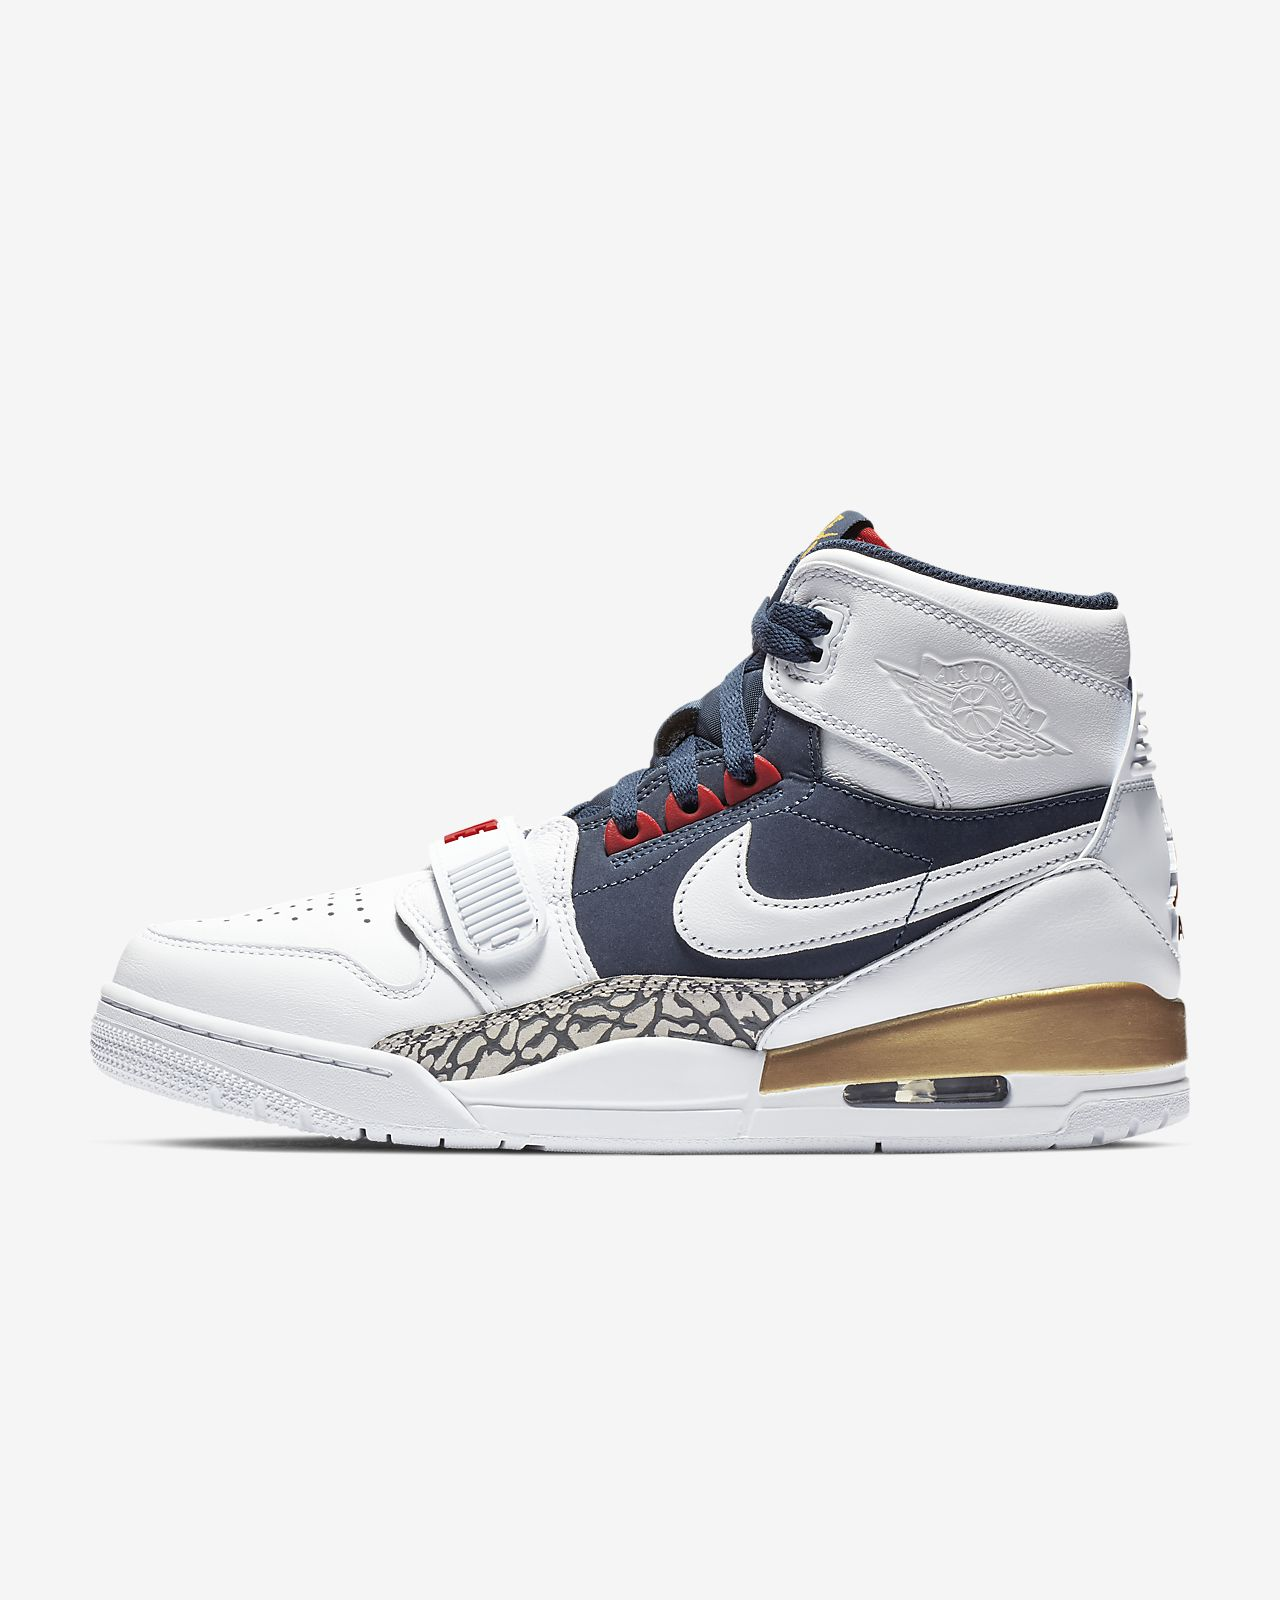 sneakers for cheap c0d40 7b4d2 ... Air Jordan Legacy 312-sko til mænd